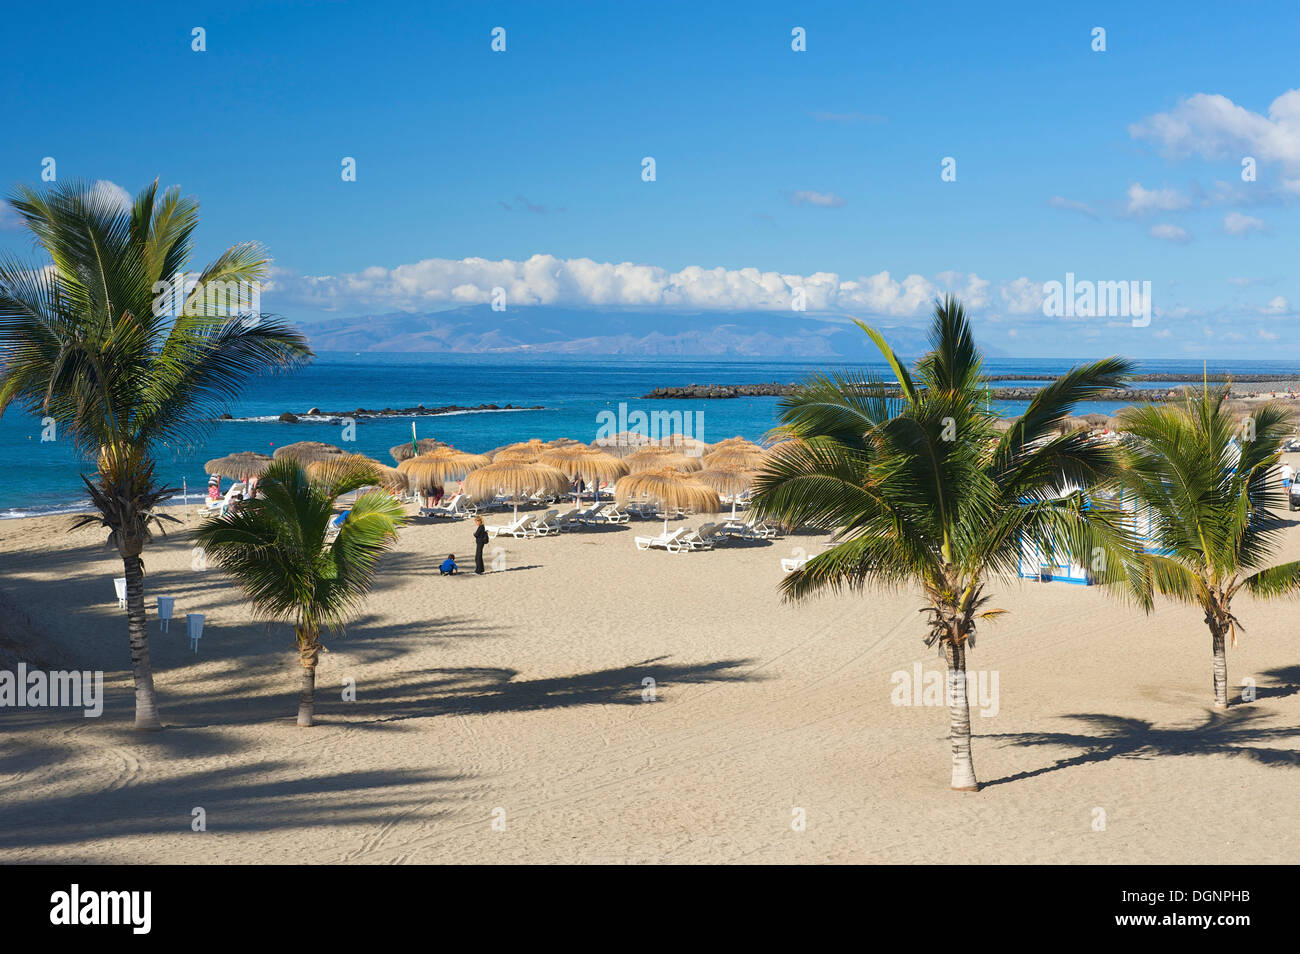 Beach of Playa del Duque, Costa Adeje, Tenerife, Spain, Europe Stock Photo, R...